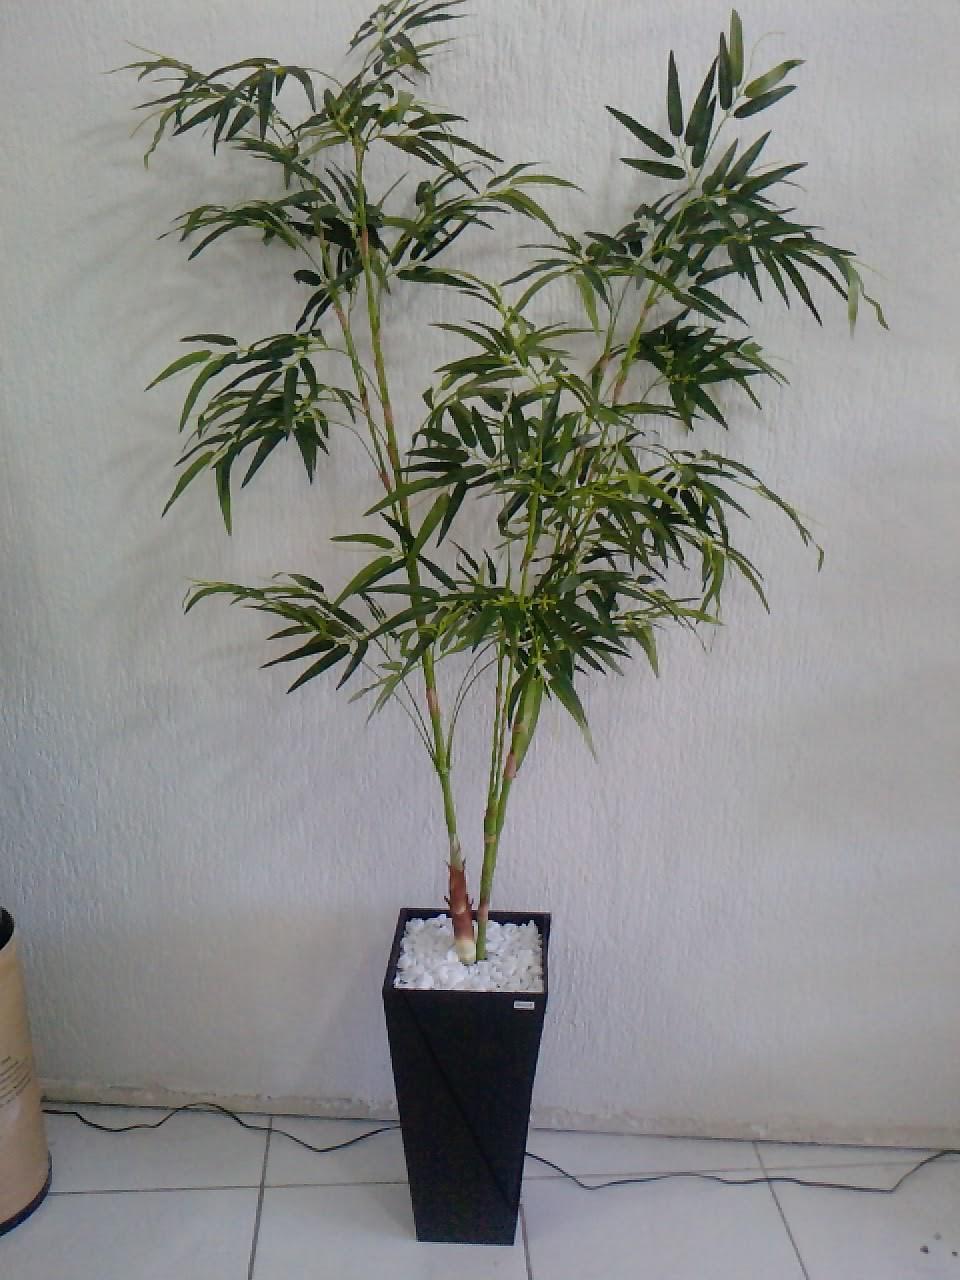 Flores do imp rio 59 vaso orqu deas 60 mini bambu - Canne bambu in vaso ...